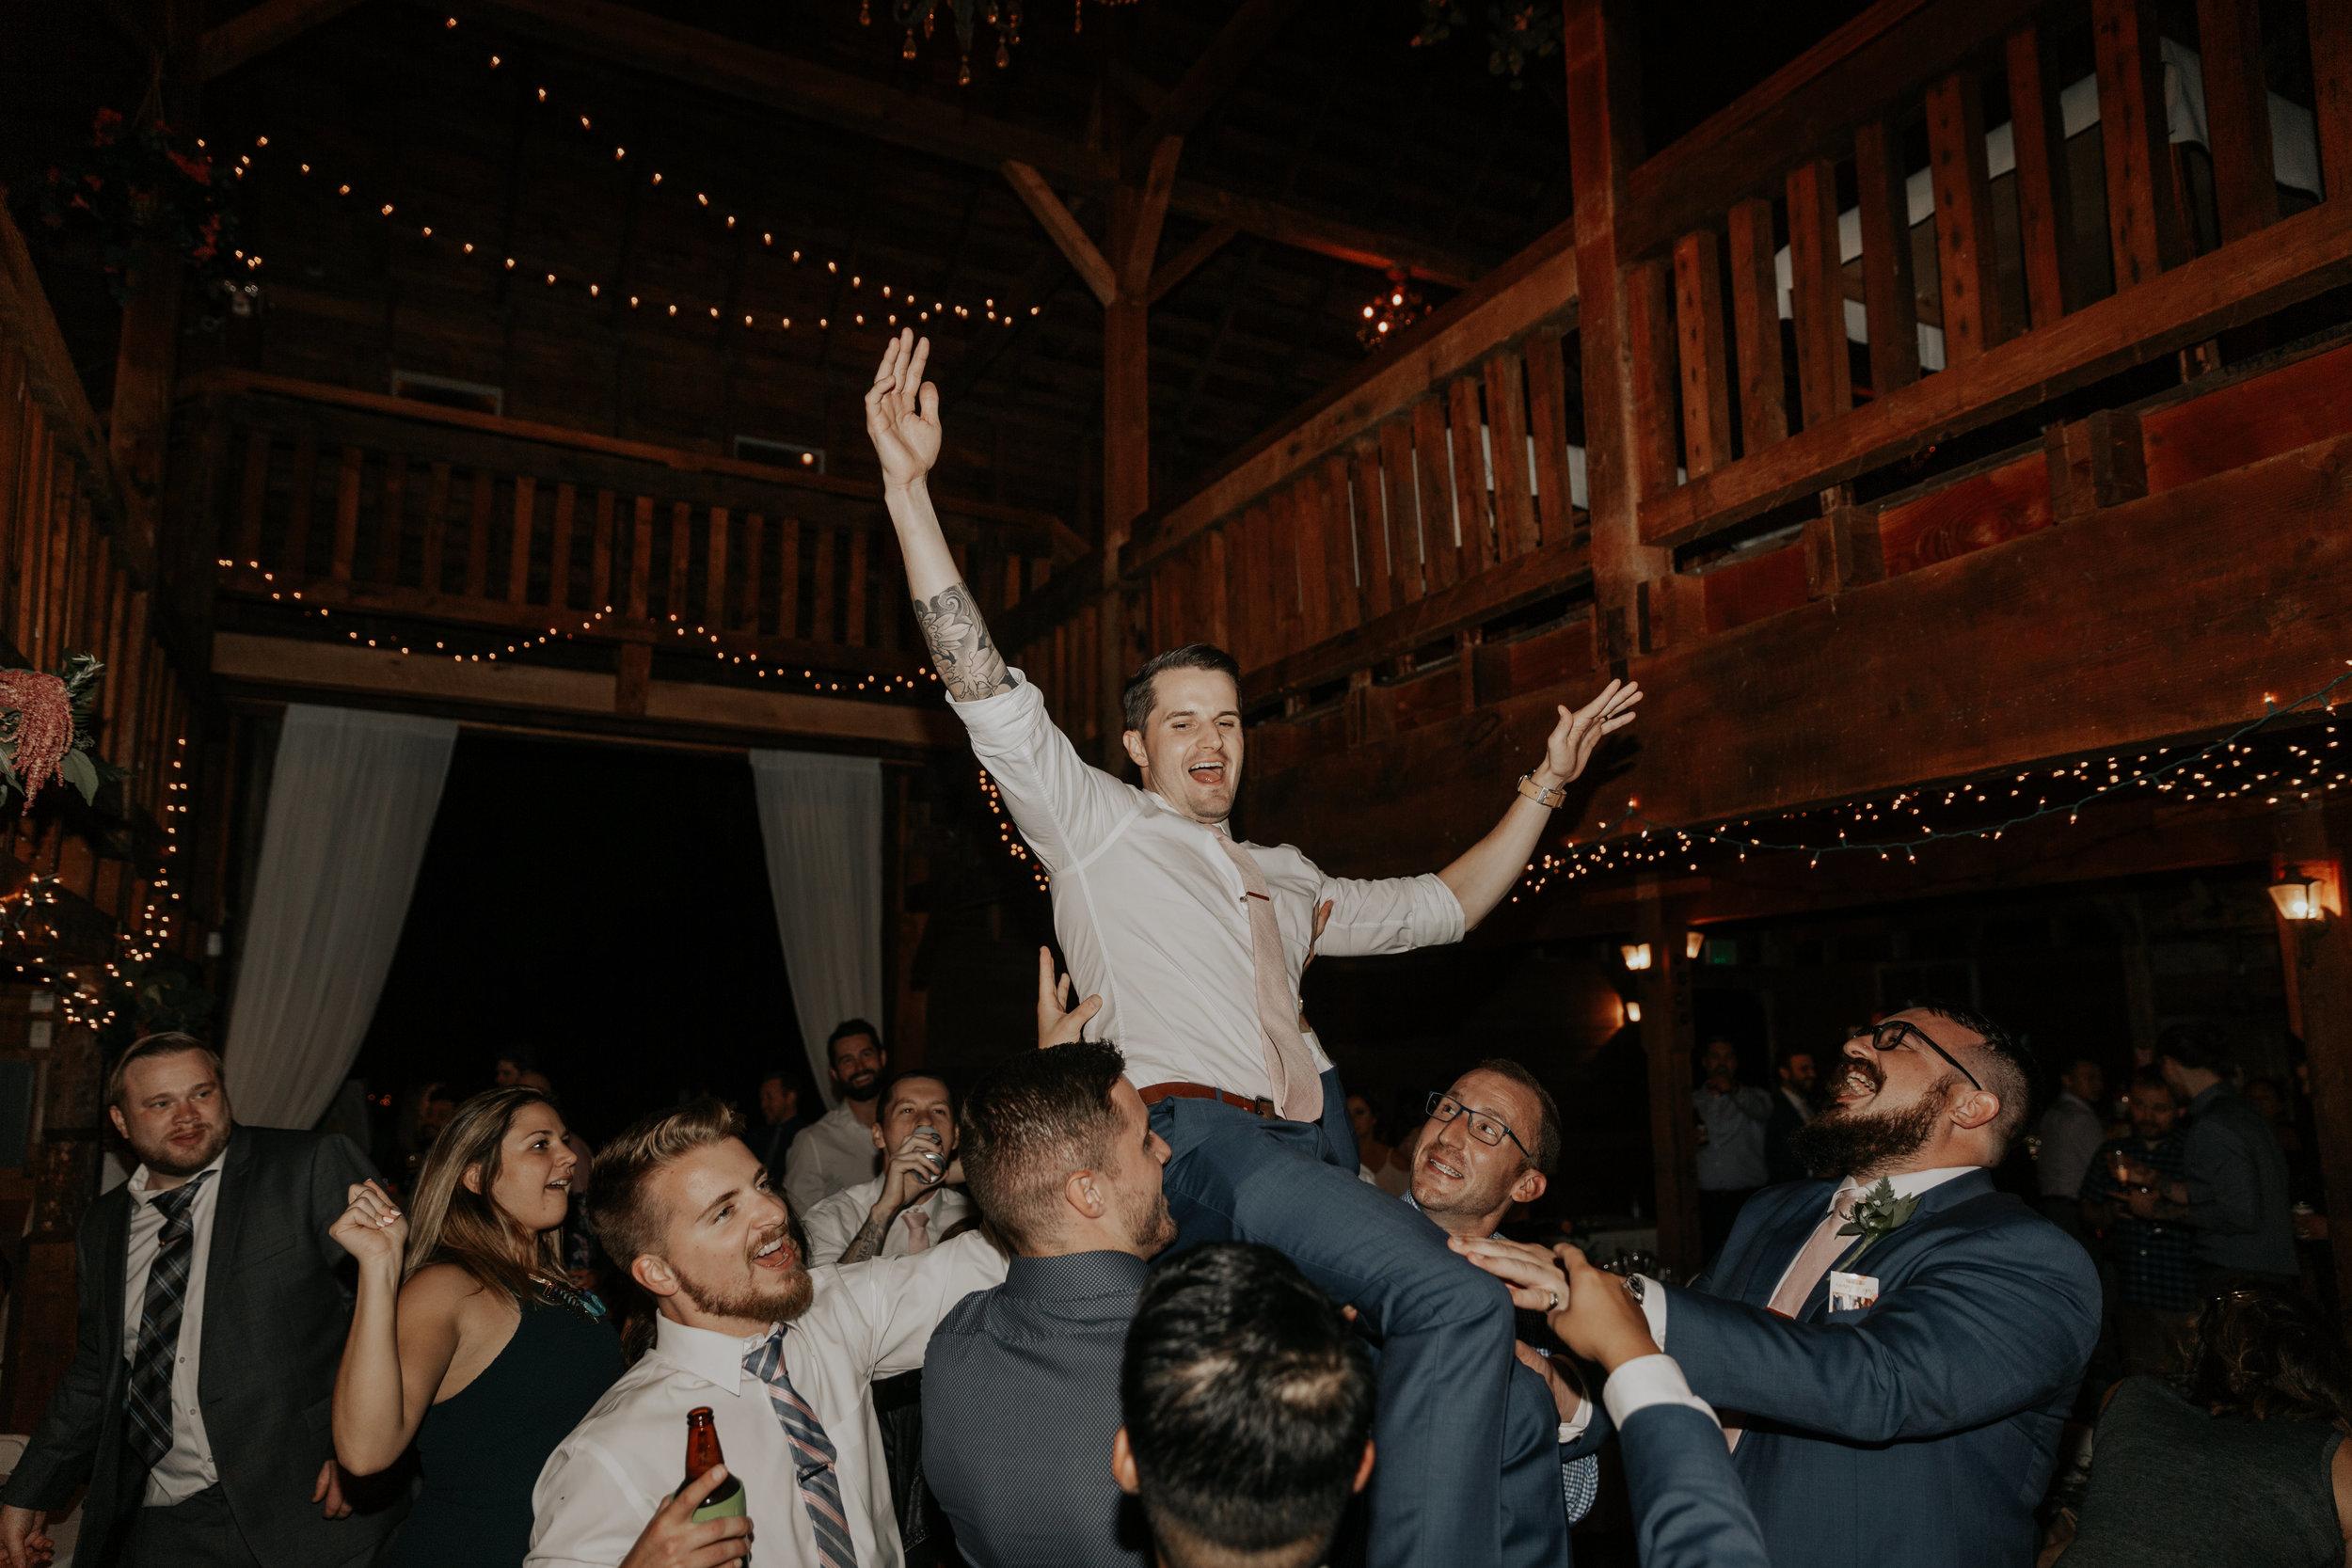 ginapaulson_jakitrevor_wedding-1121.jpg